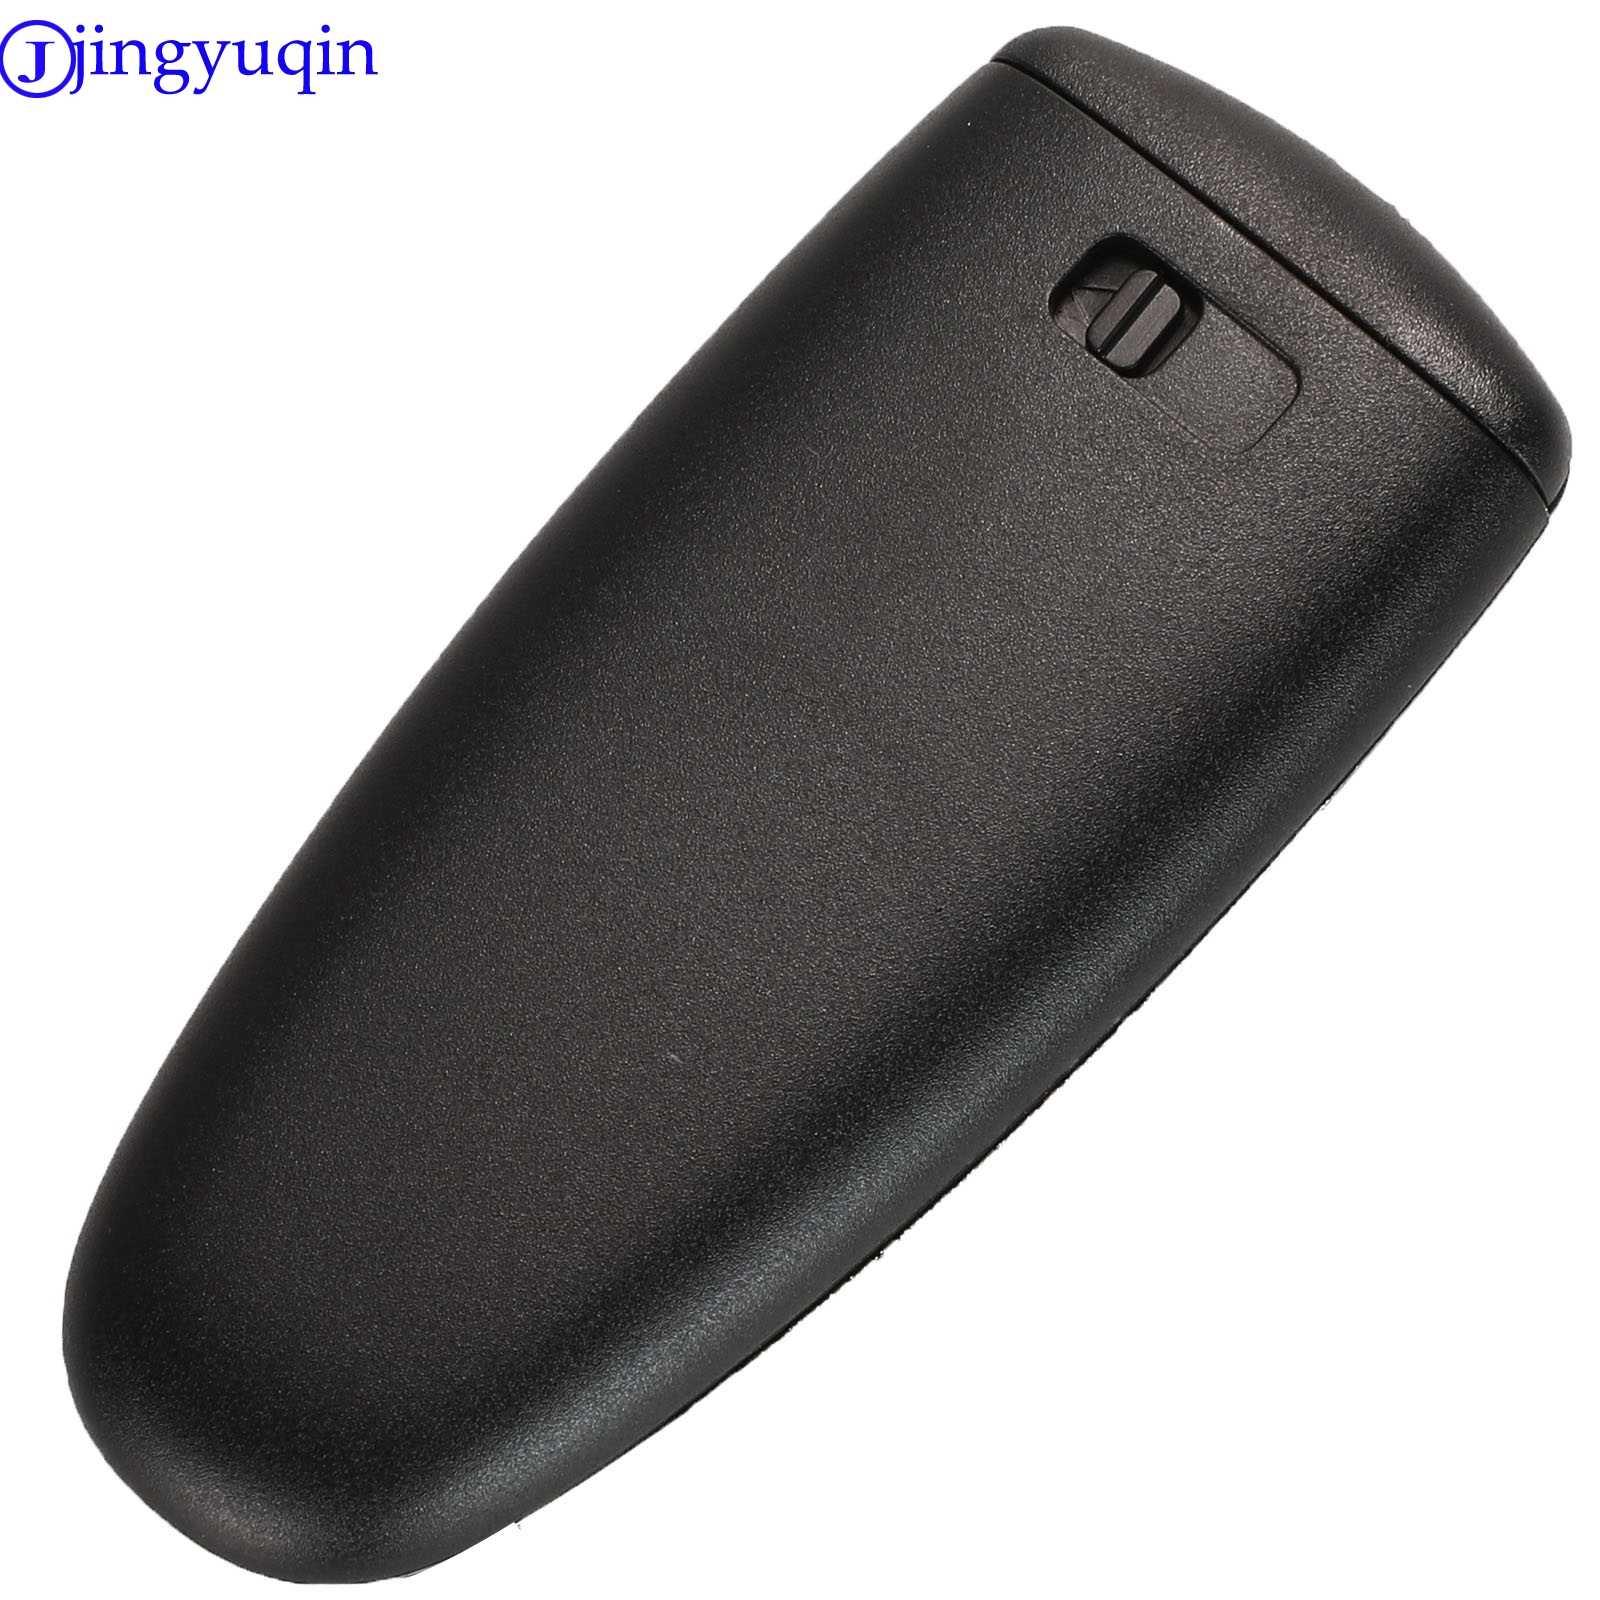 Jingyuqin 5 шт. 5 кнопок чехол для дистанционного ключа от машины крышка Fob для Ford Explorer Edge Escape Flex Телец 2011 2012 2013 2014 2015 Smart